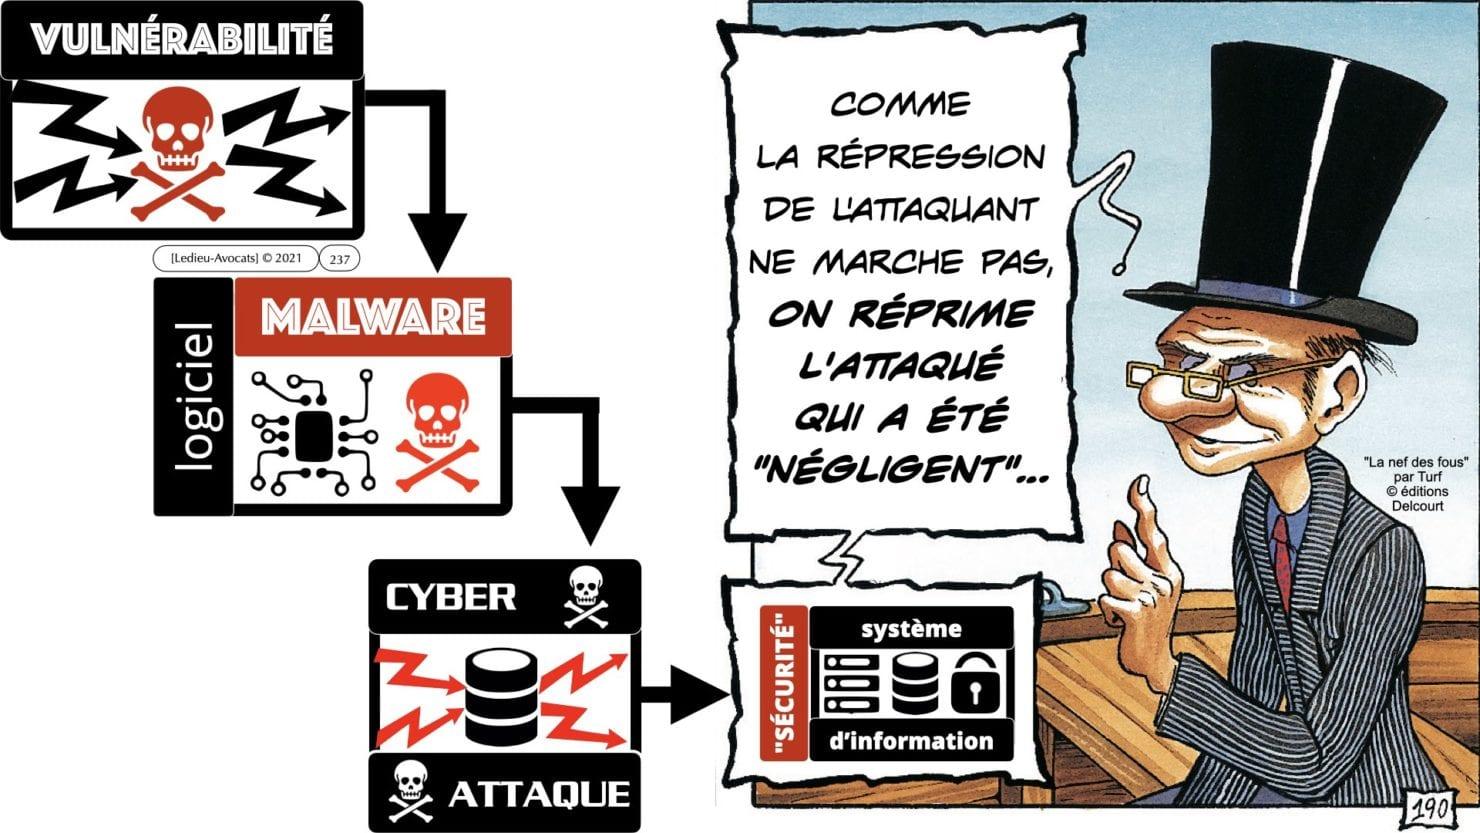 RGPD e-Privacy principes actualité jurisprudence ©Ledieu-Avocats 25-06-2021.237